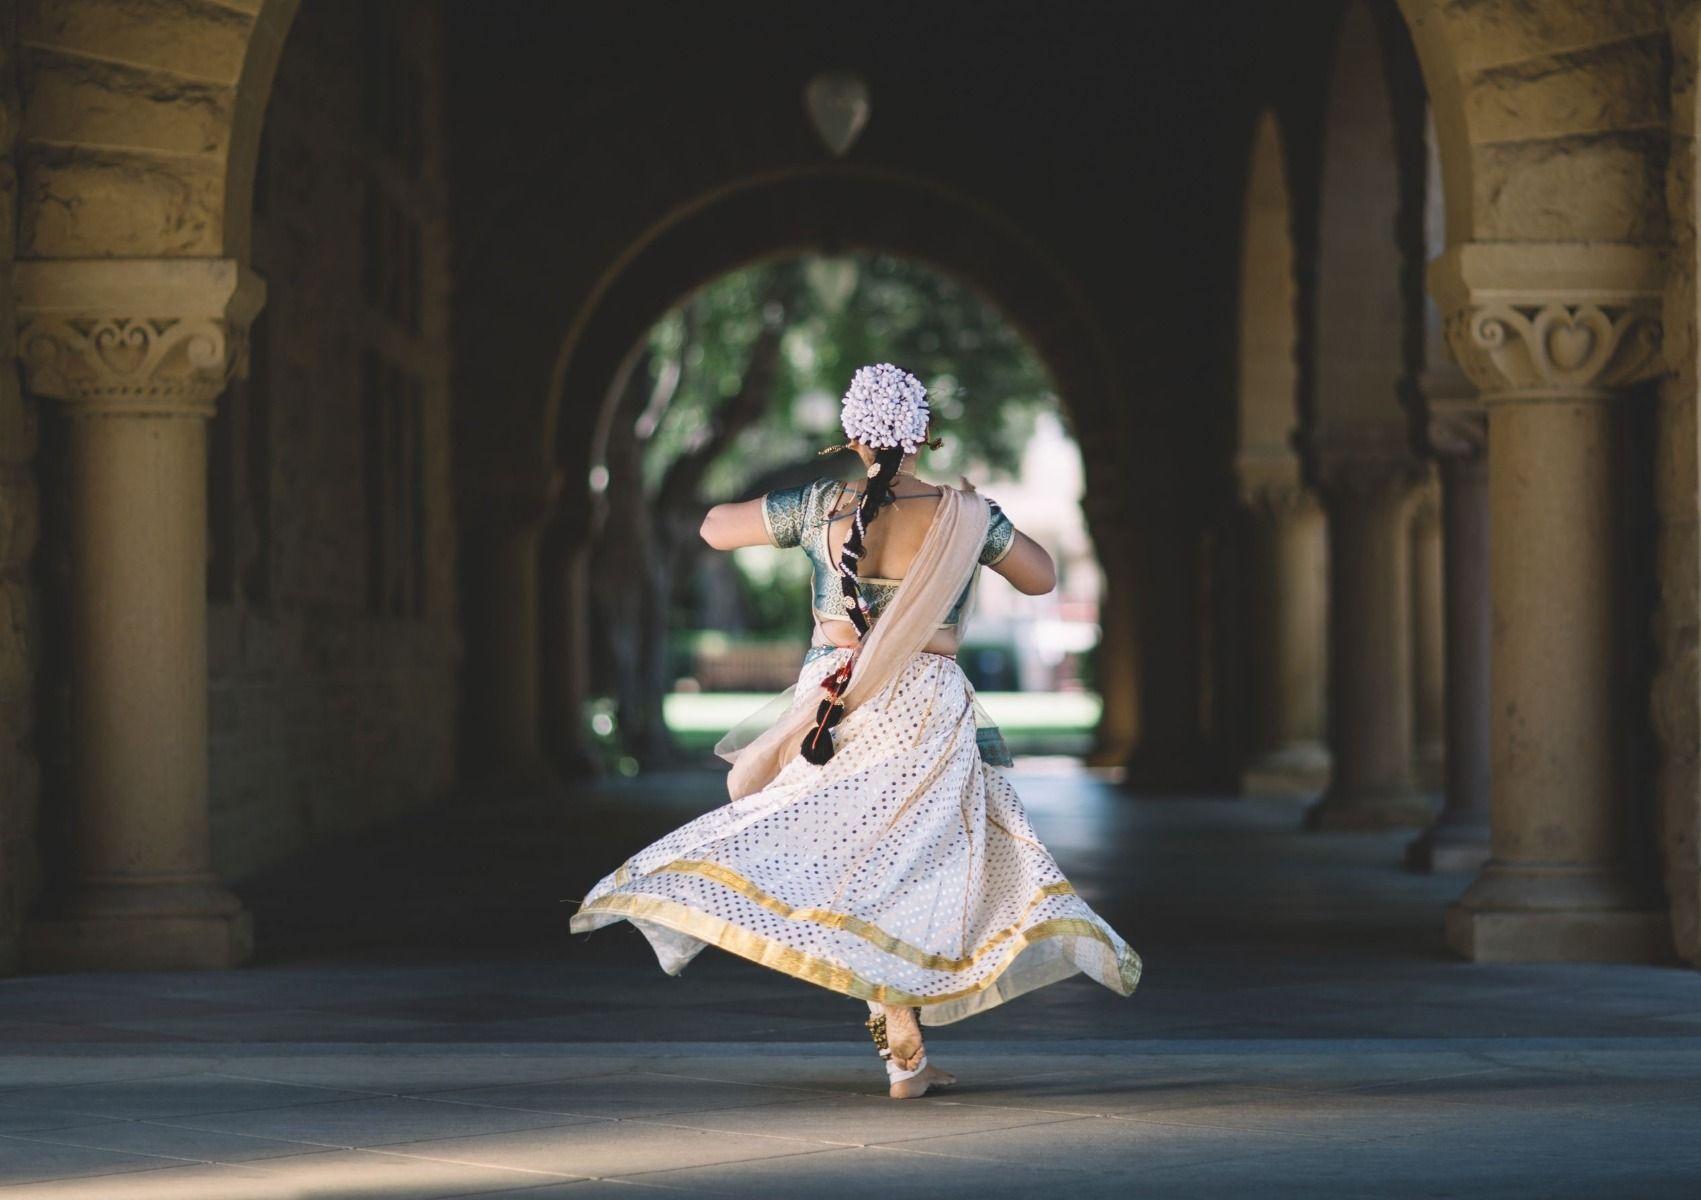 Sari dancer with flower